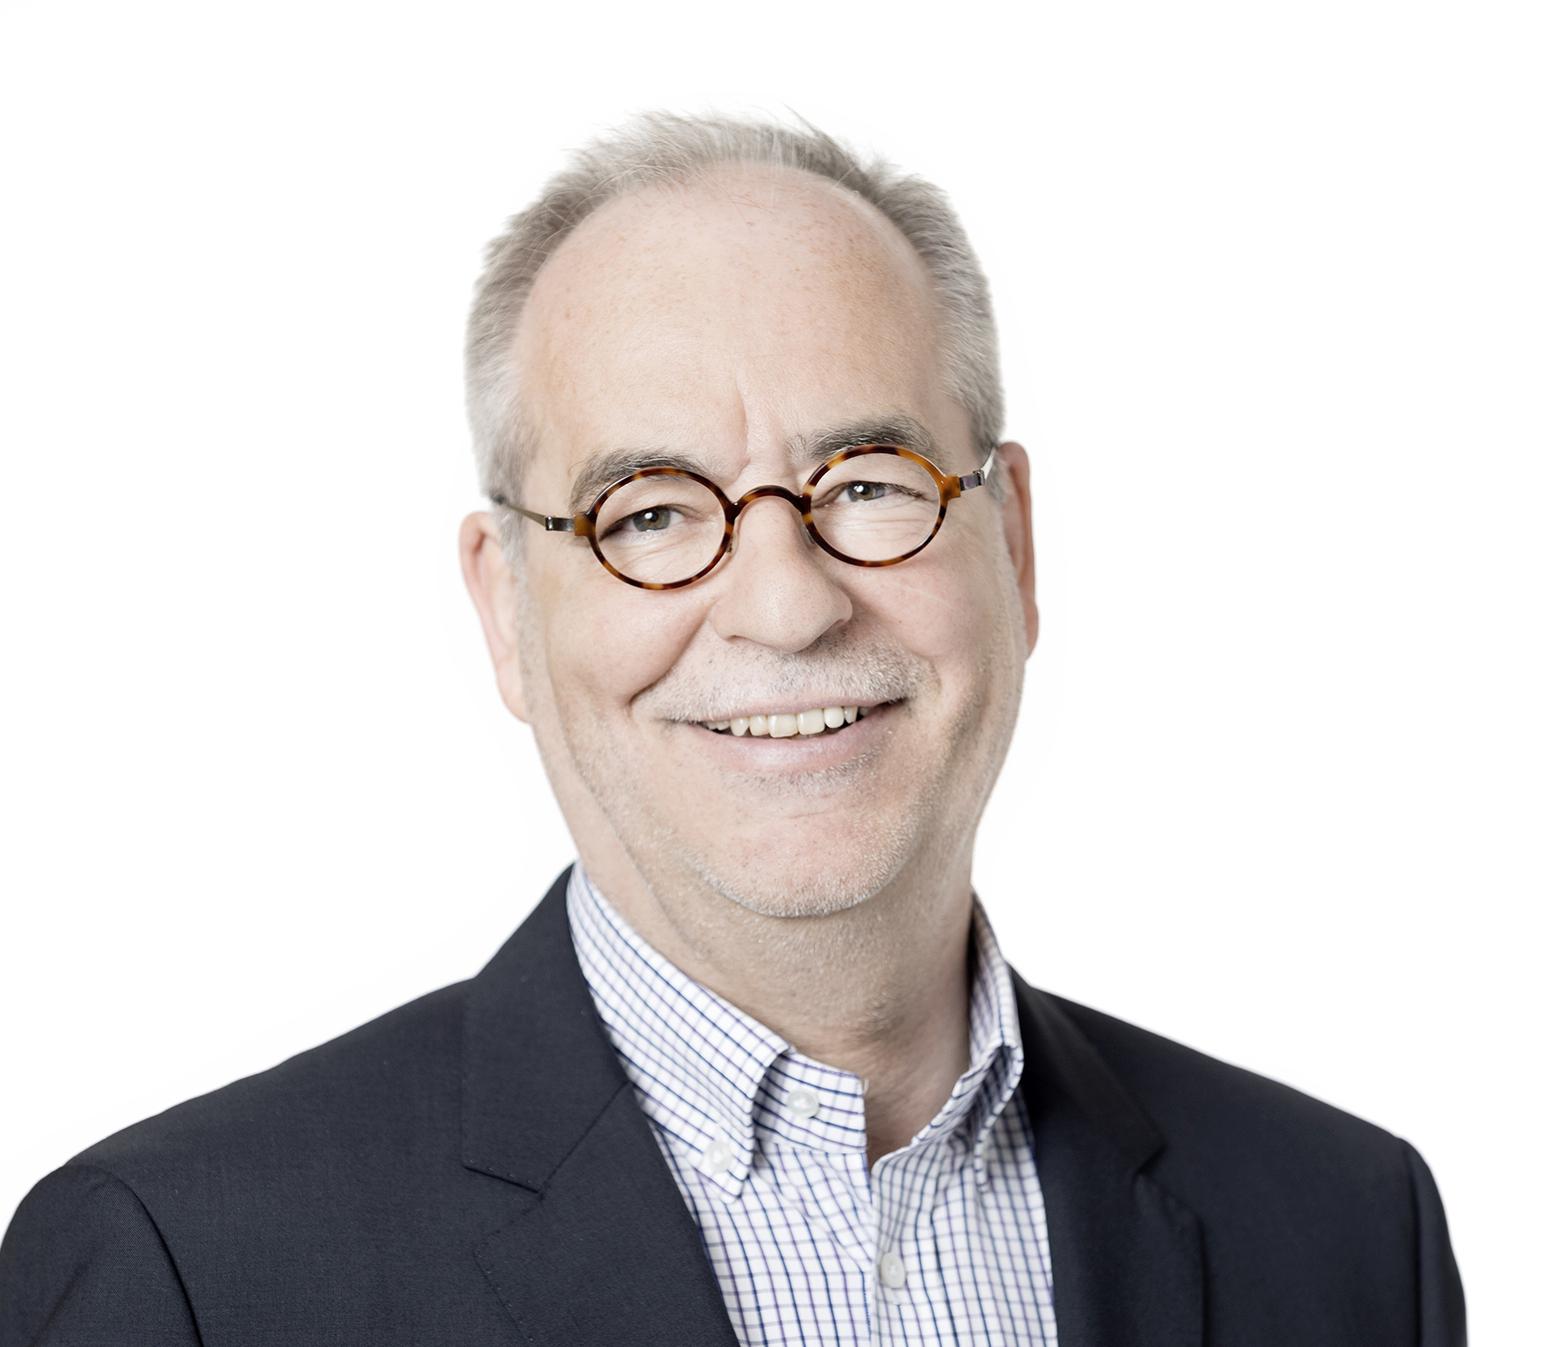 Prof. Dr. Otfried Jarren